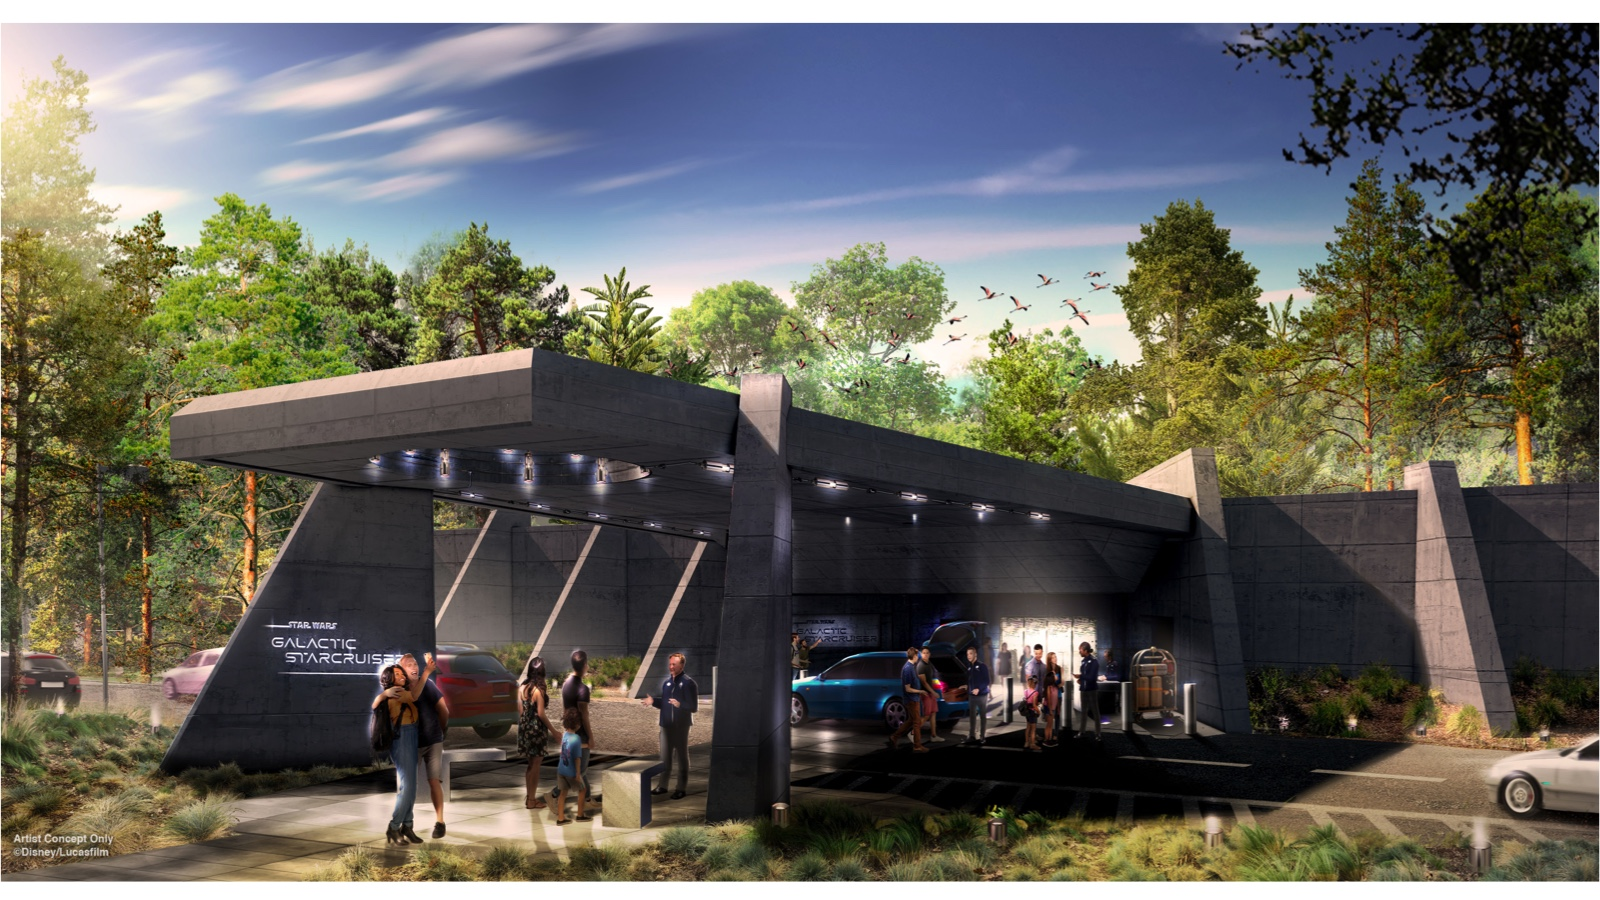 Walt Disney World Update: Star Wars: Galactic Starcruiser Pre-Sale Announced